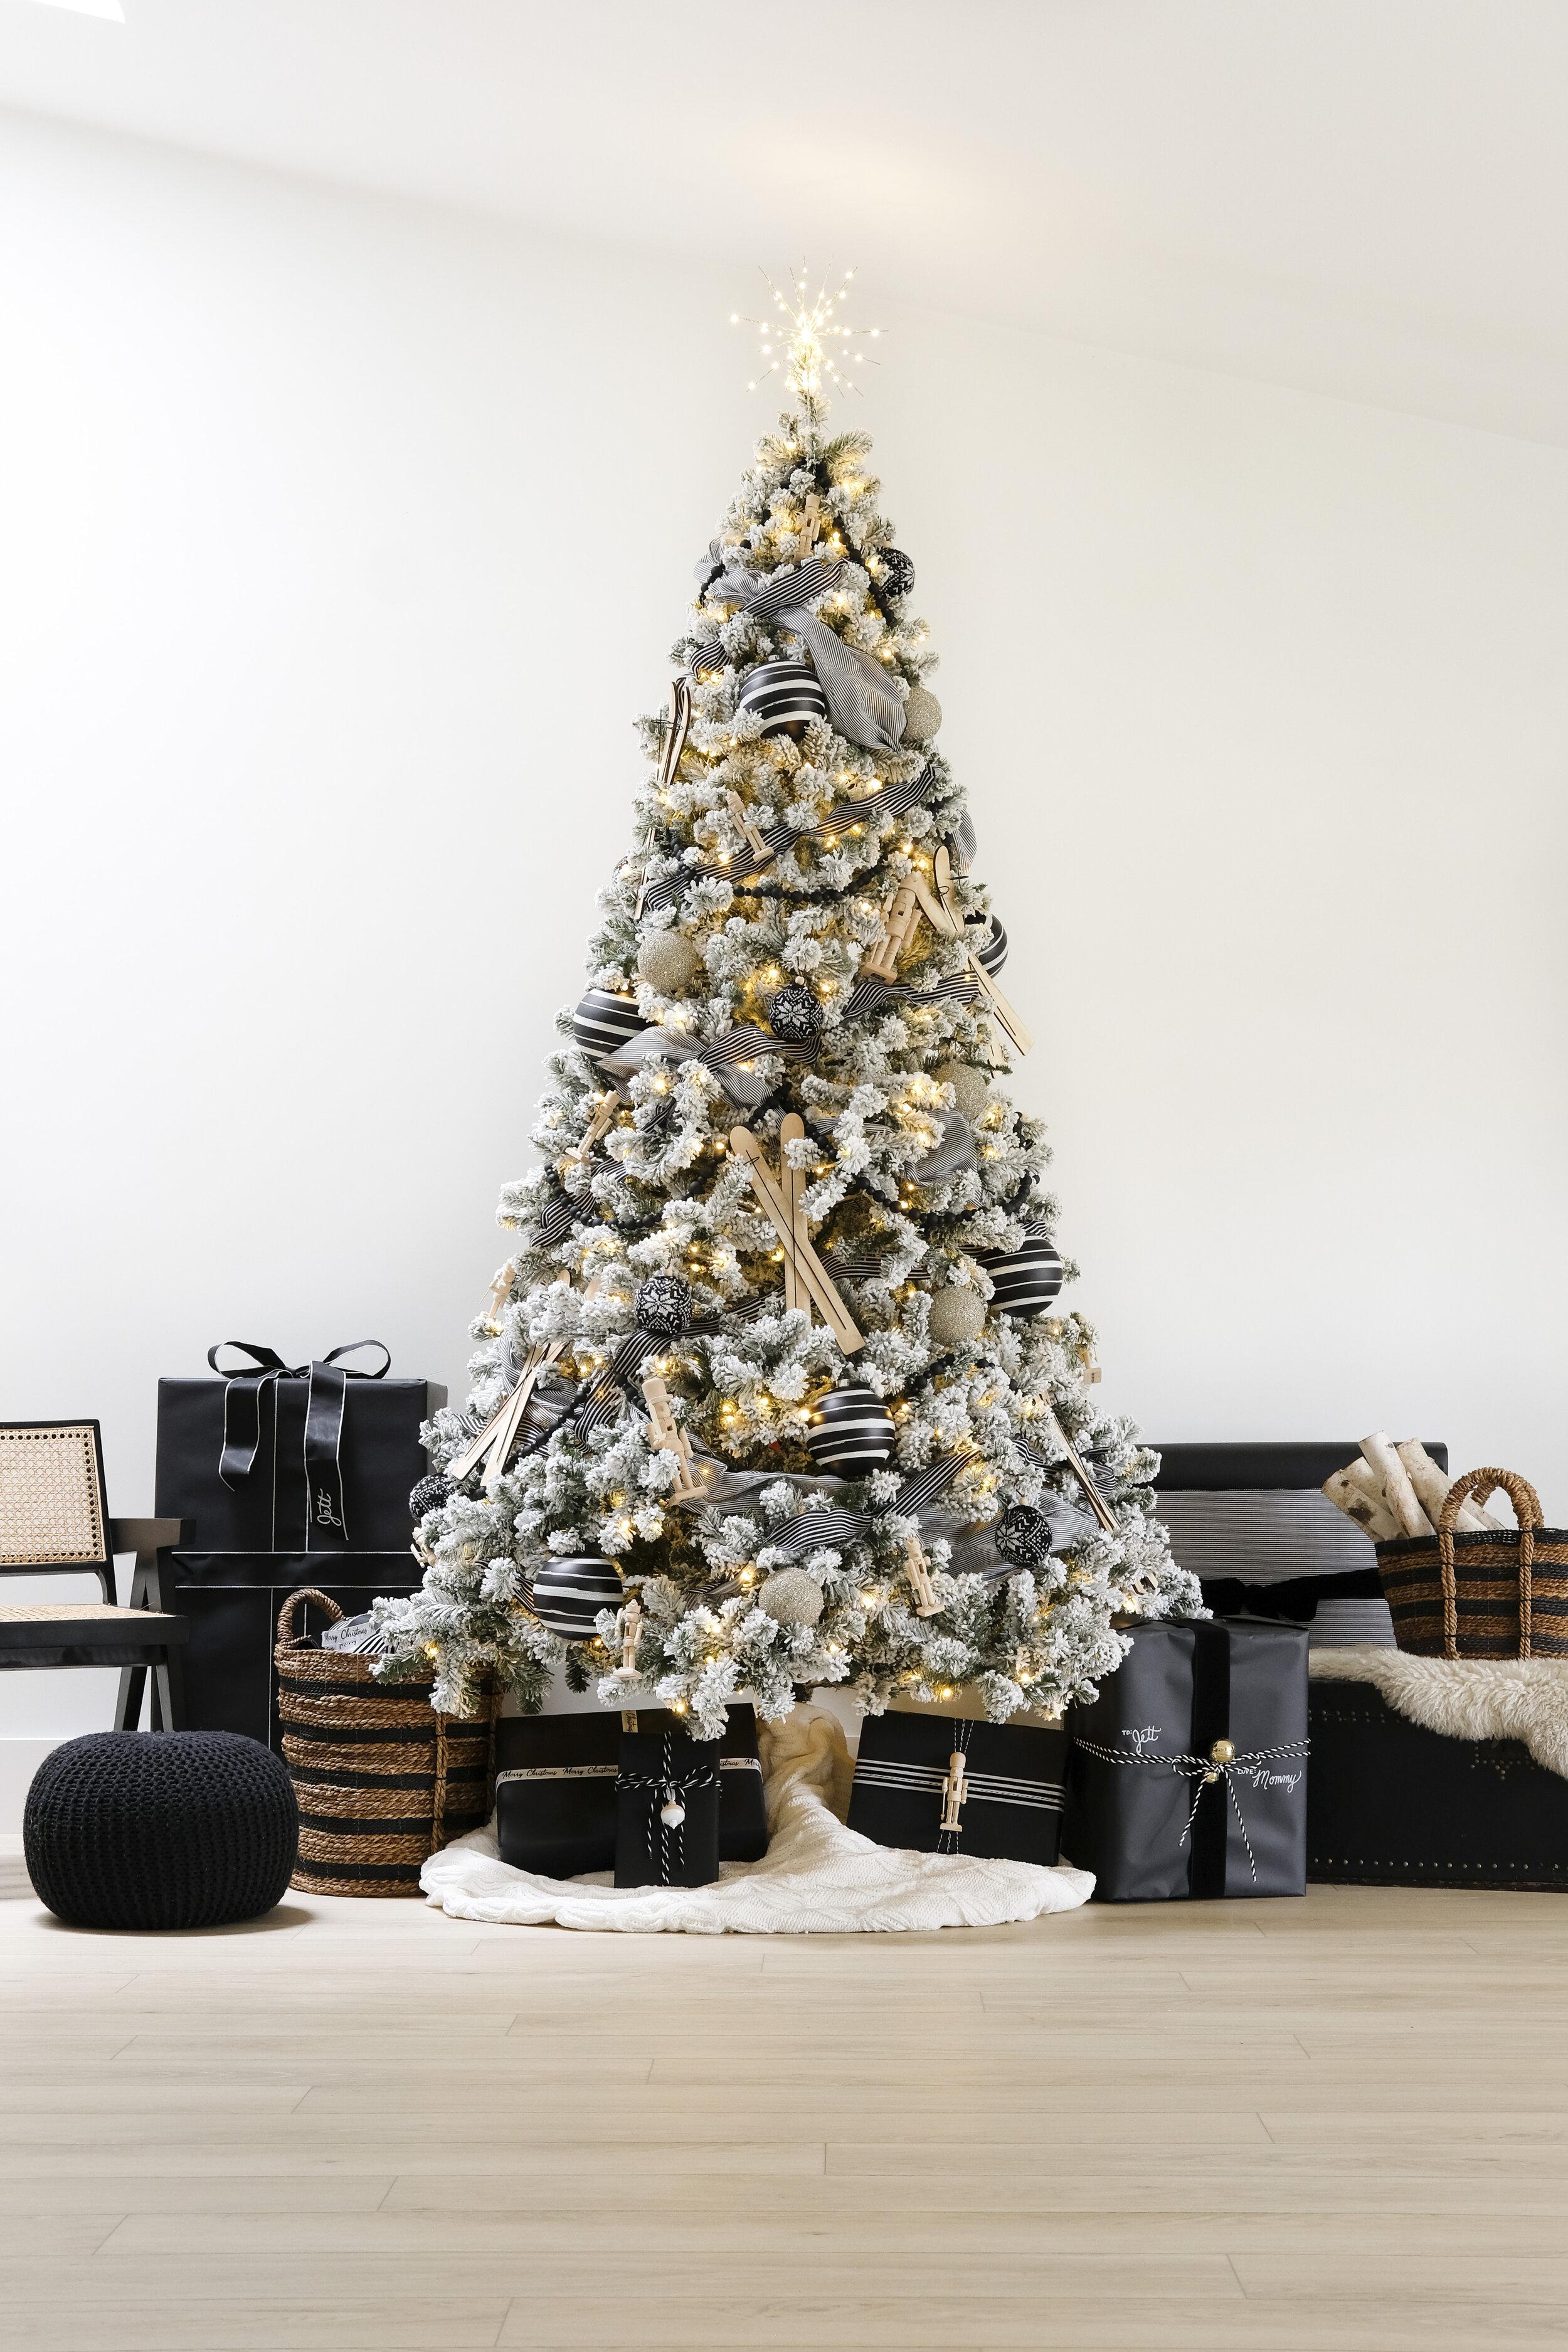 Christmas Decor 2020 Our Black White Christmas Tree Me And Mr Jones